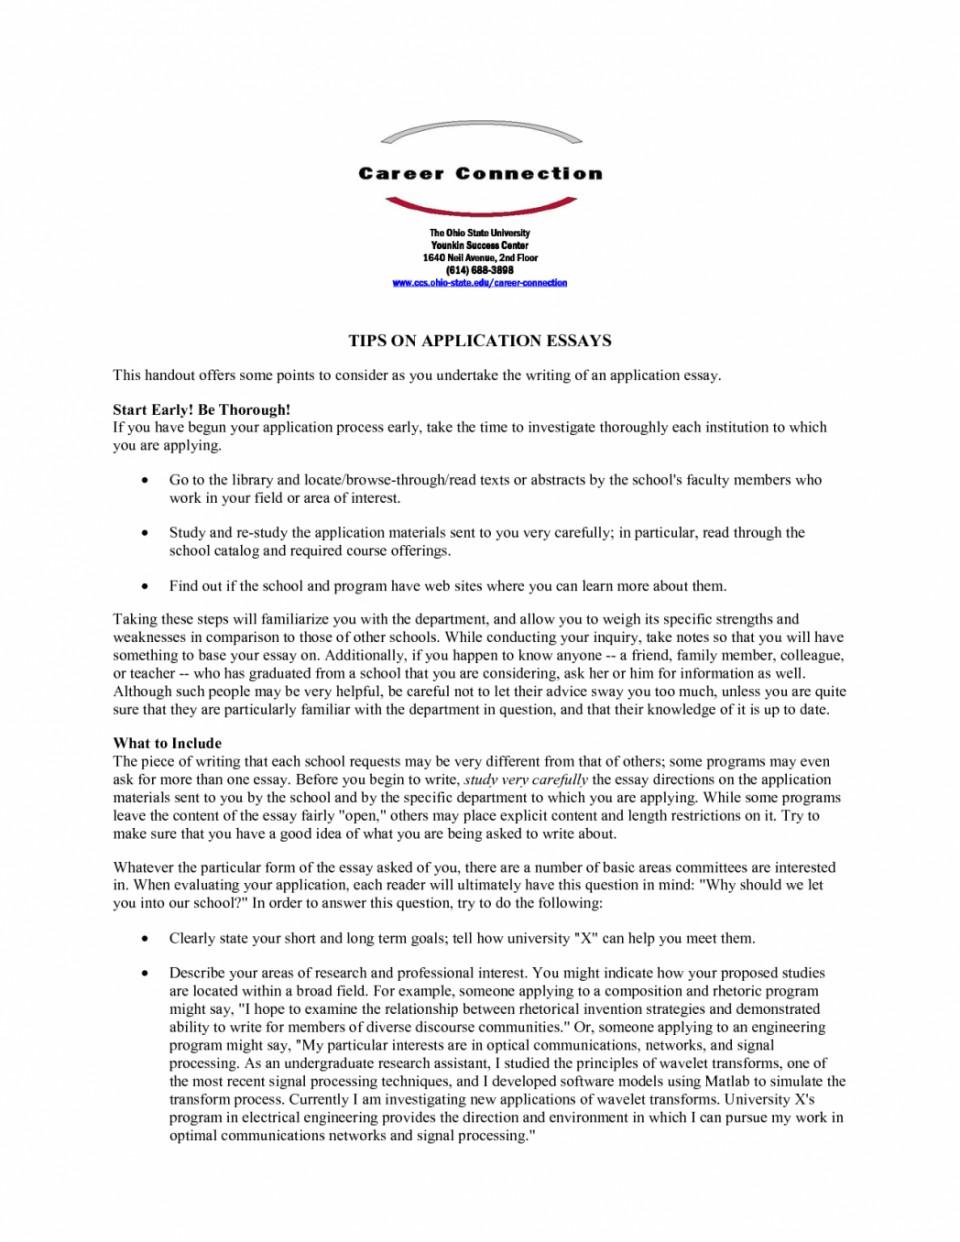 Medical school admission essay examples